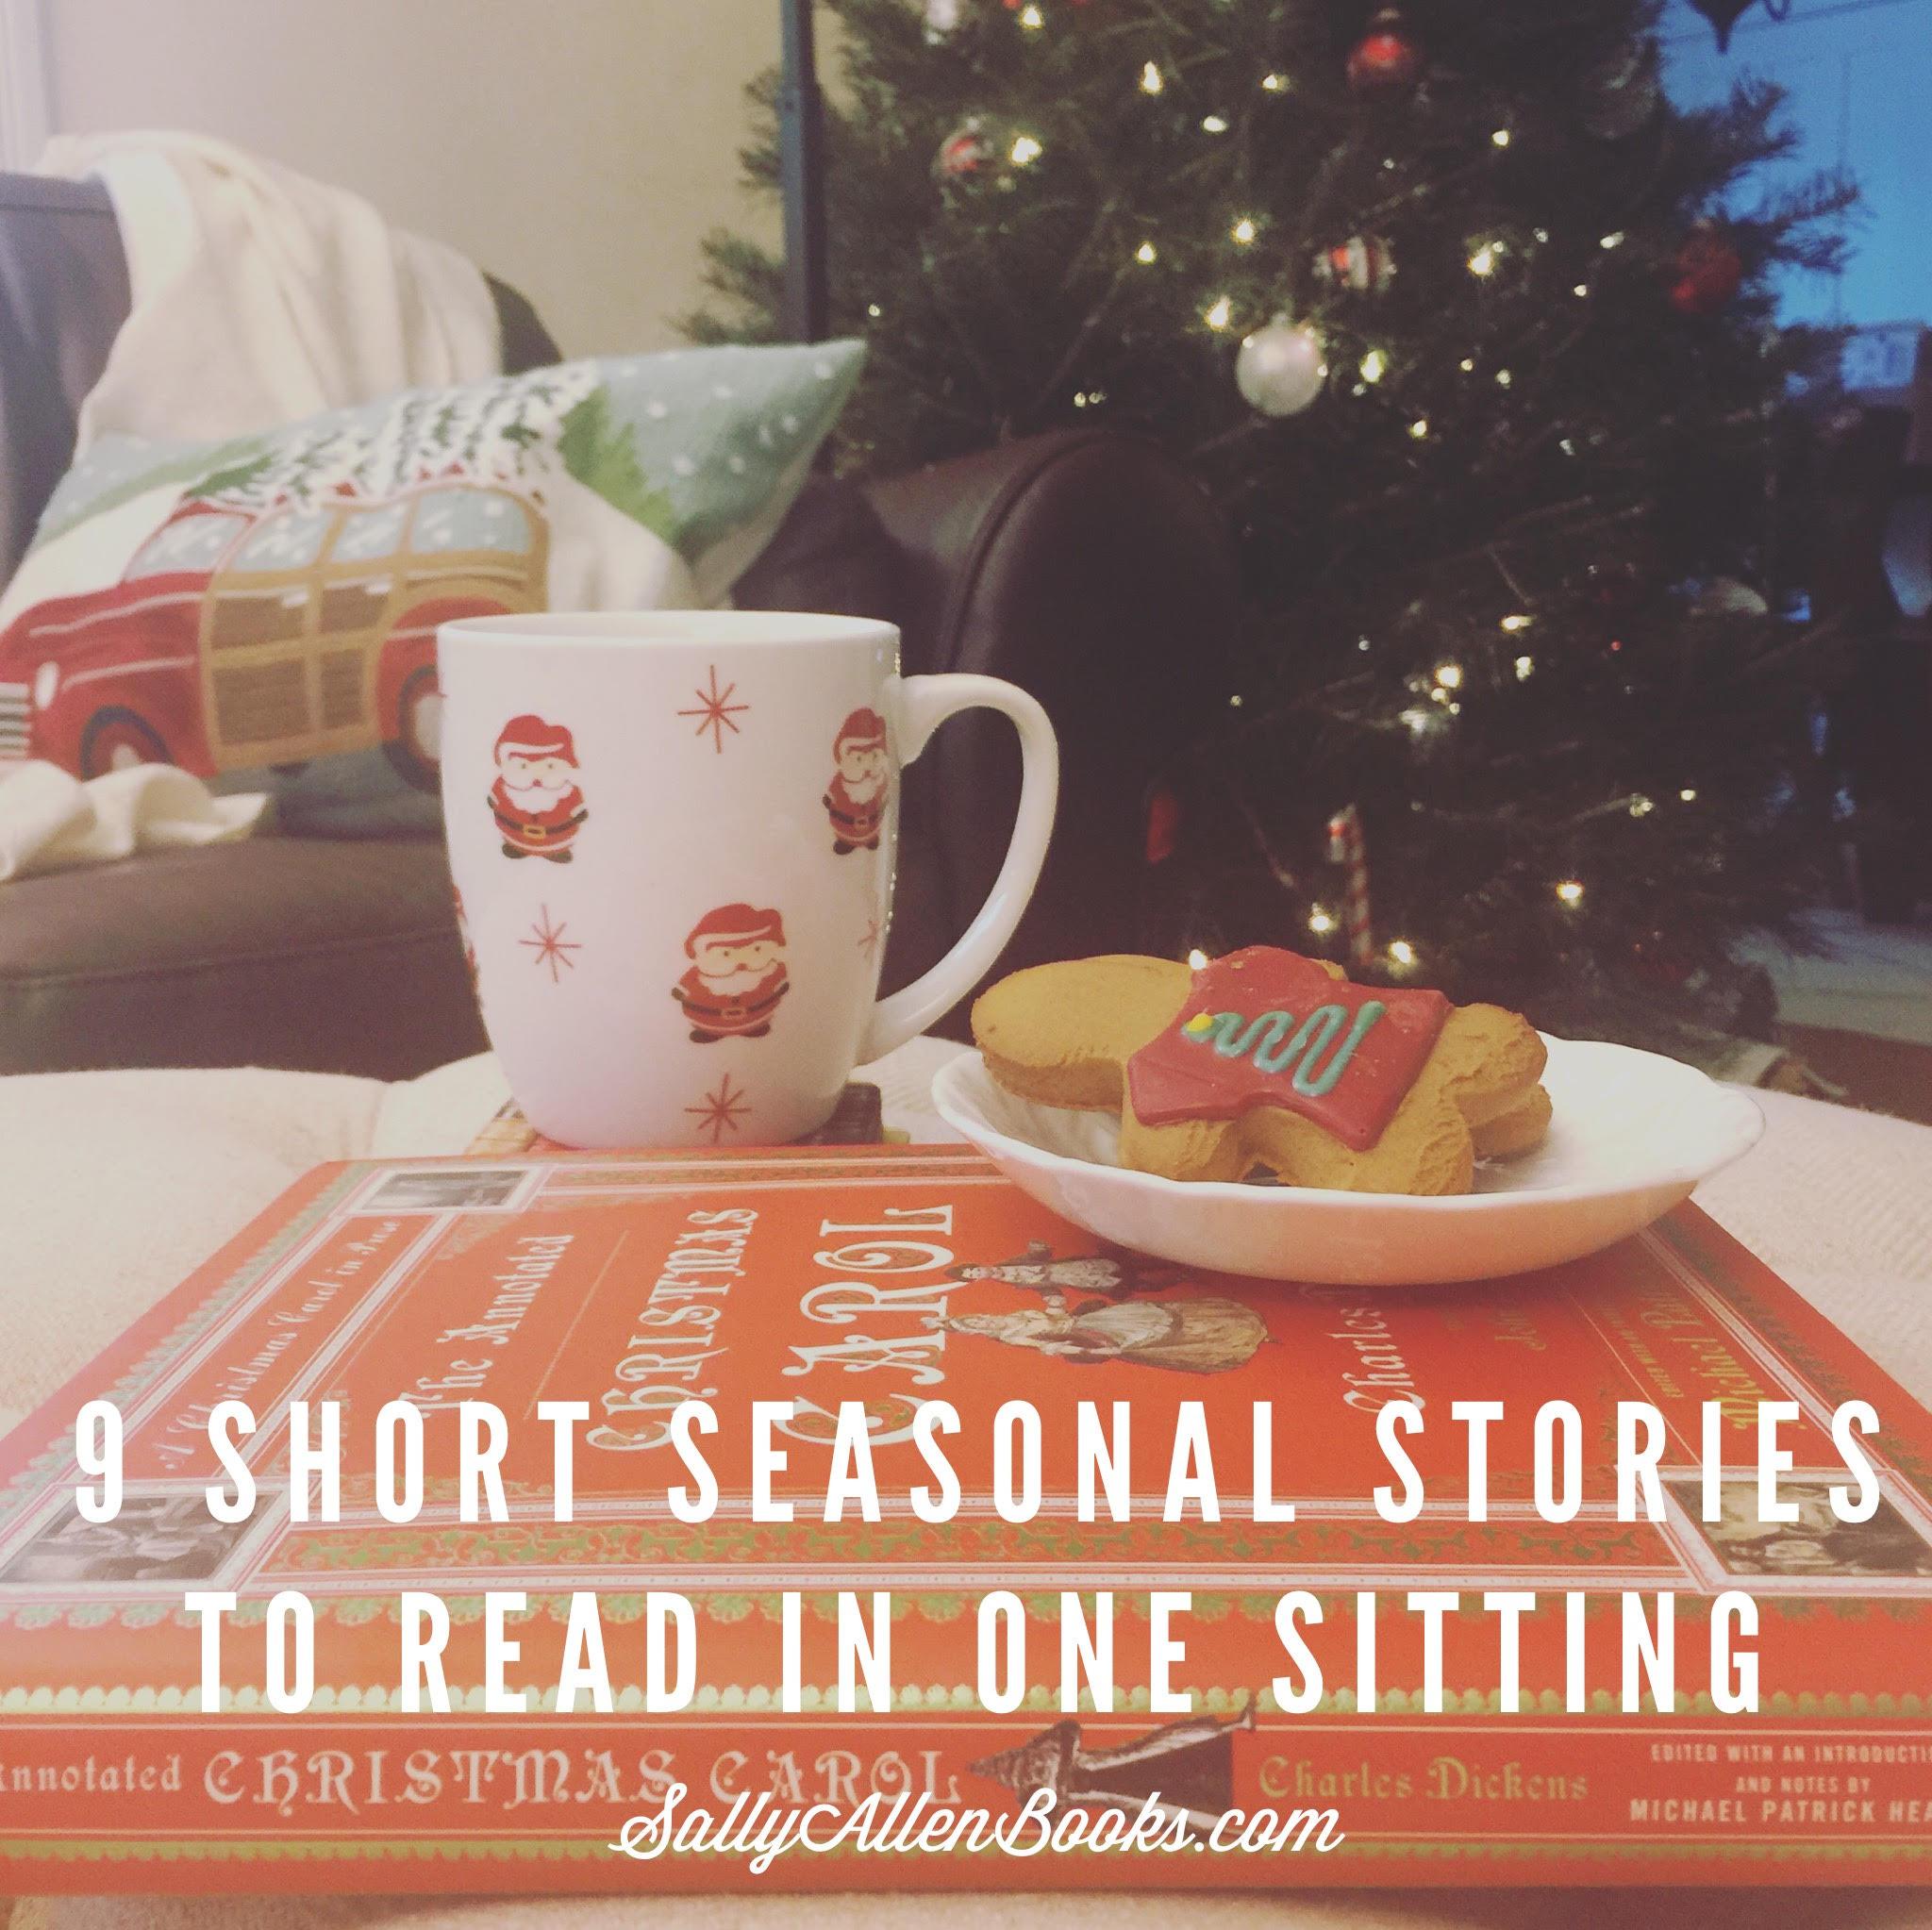 9Short Stories About True Love pics